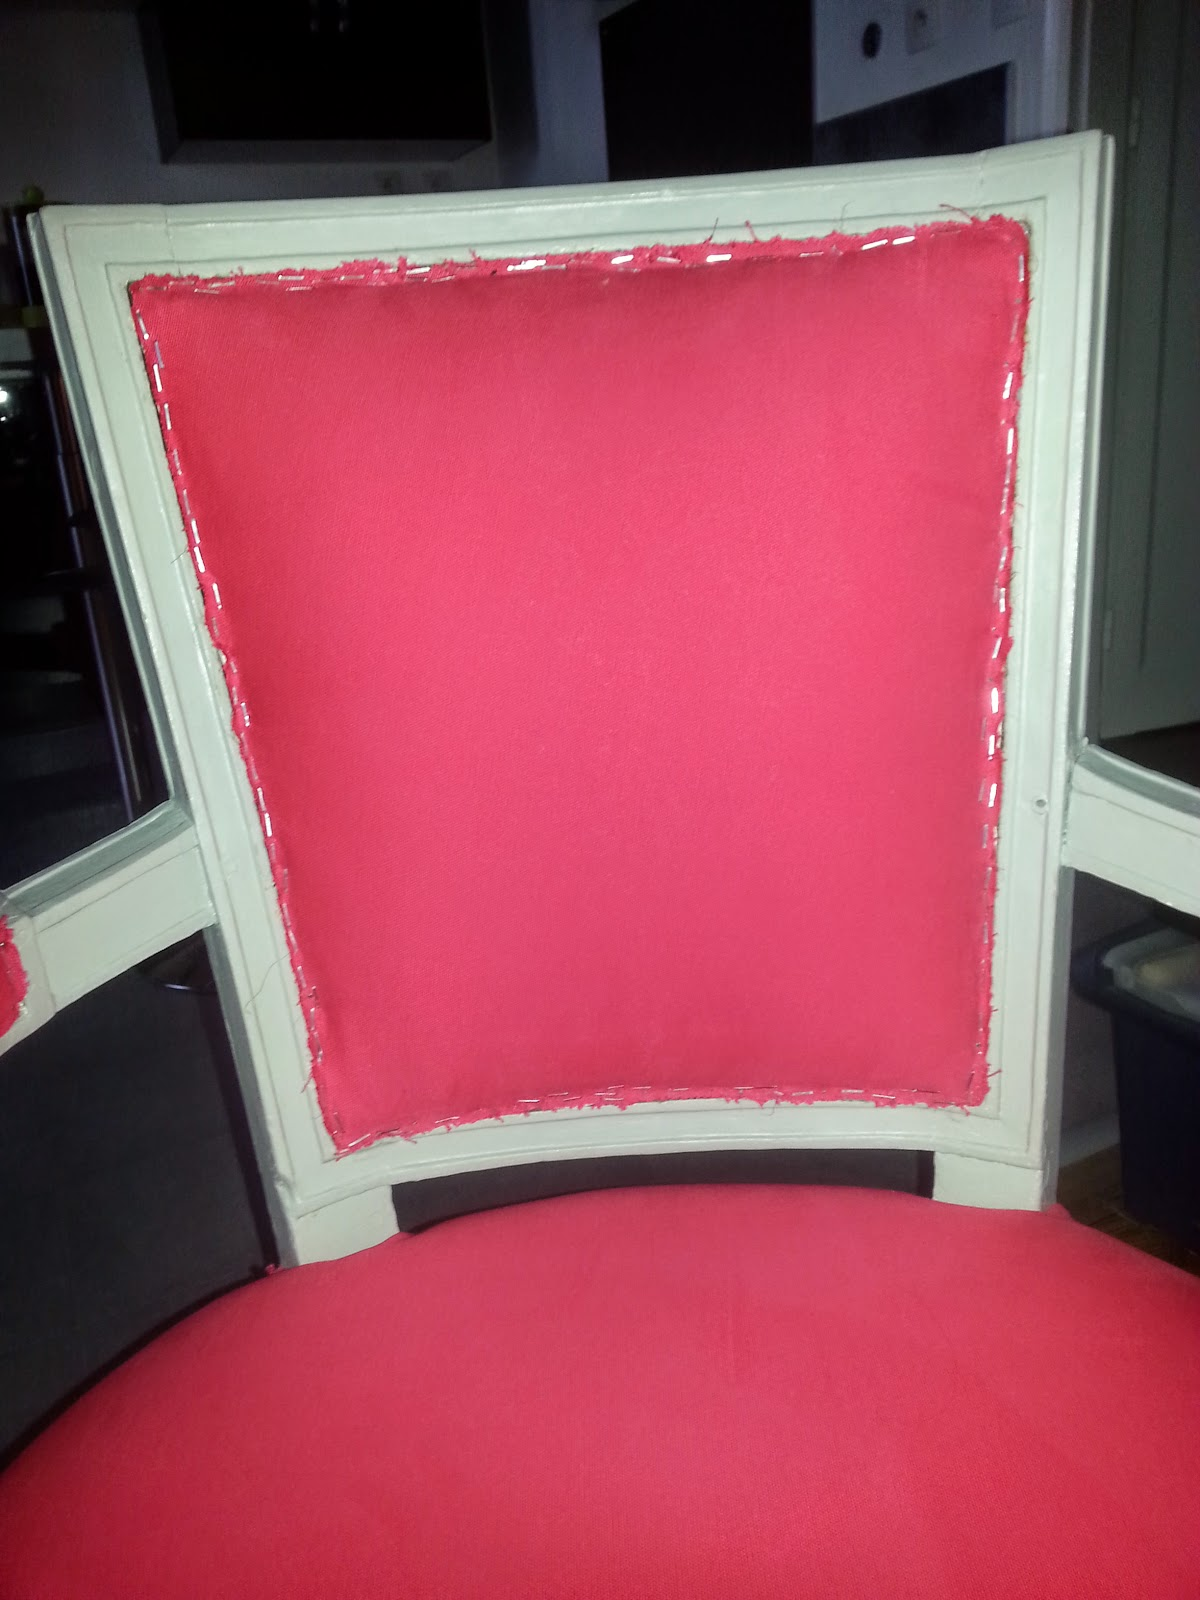 merci cl mence retaper des fauteuils directoire 2 3. Black Bedroom Furniture Sets. Home Design Ideas